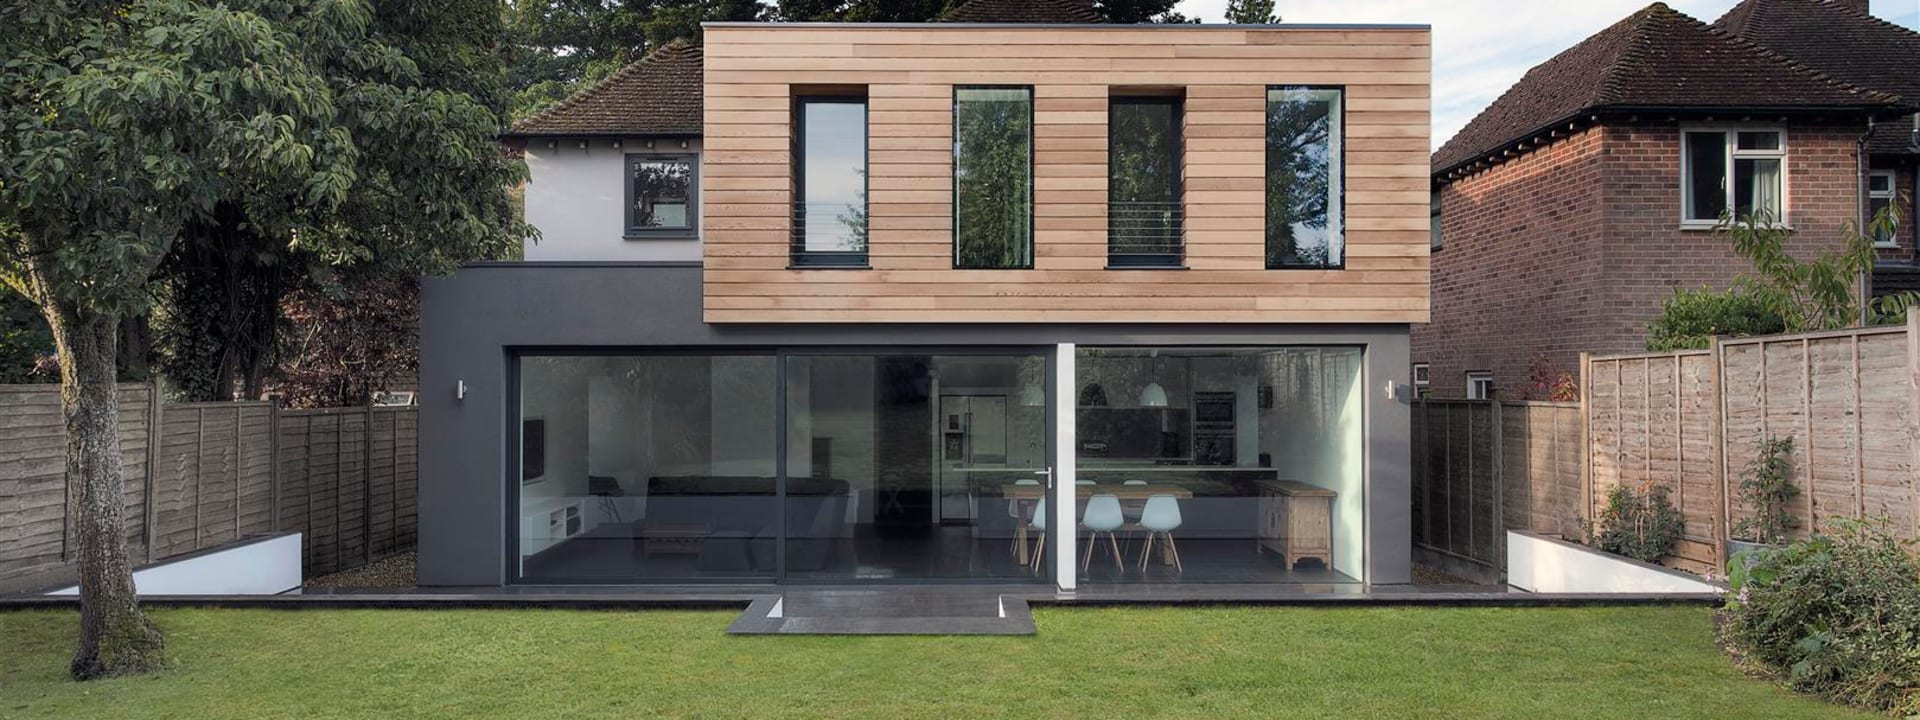 Home Decorating, Interior Design, Bath & Kitchen Ideas   homify